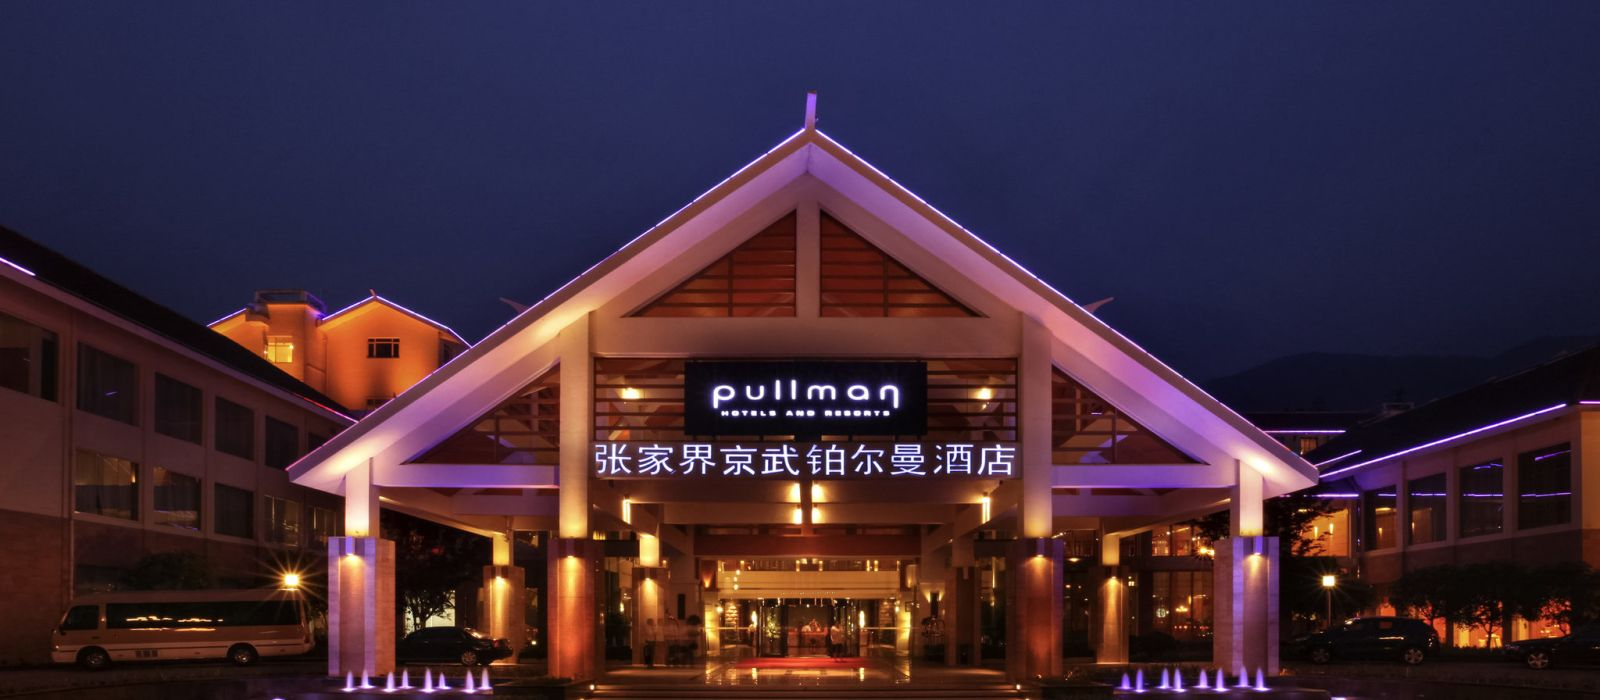 Hotel Pullman Zhangjiajie  China